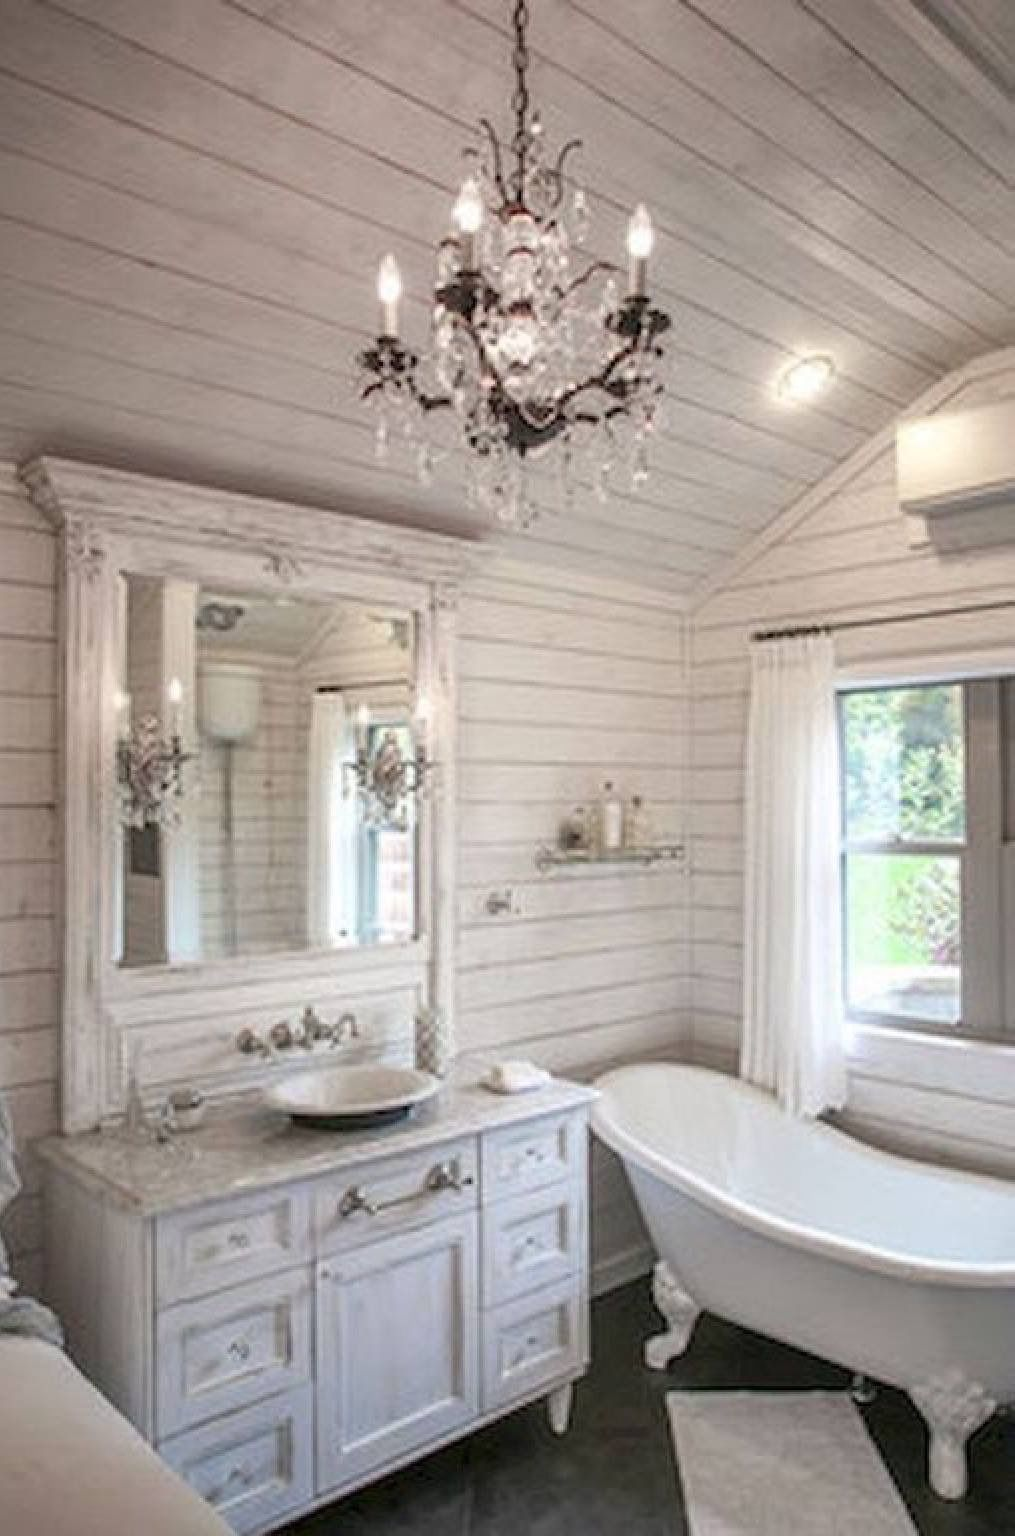 Mirror Surround Tiny House Bathroom Shabby Chic Bathroom Small Bathroom Remodel